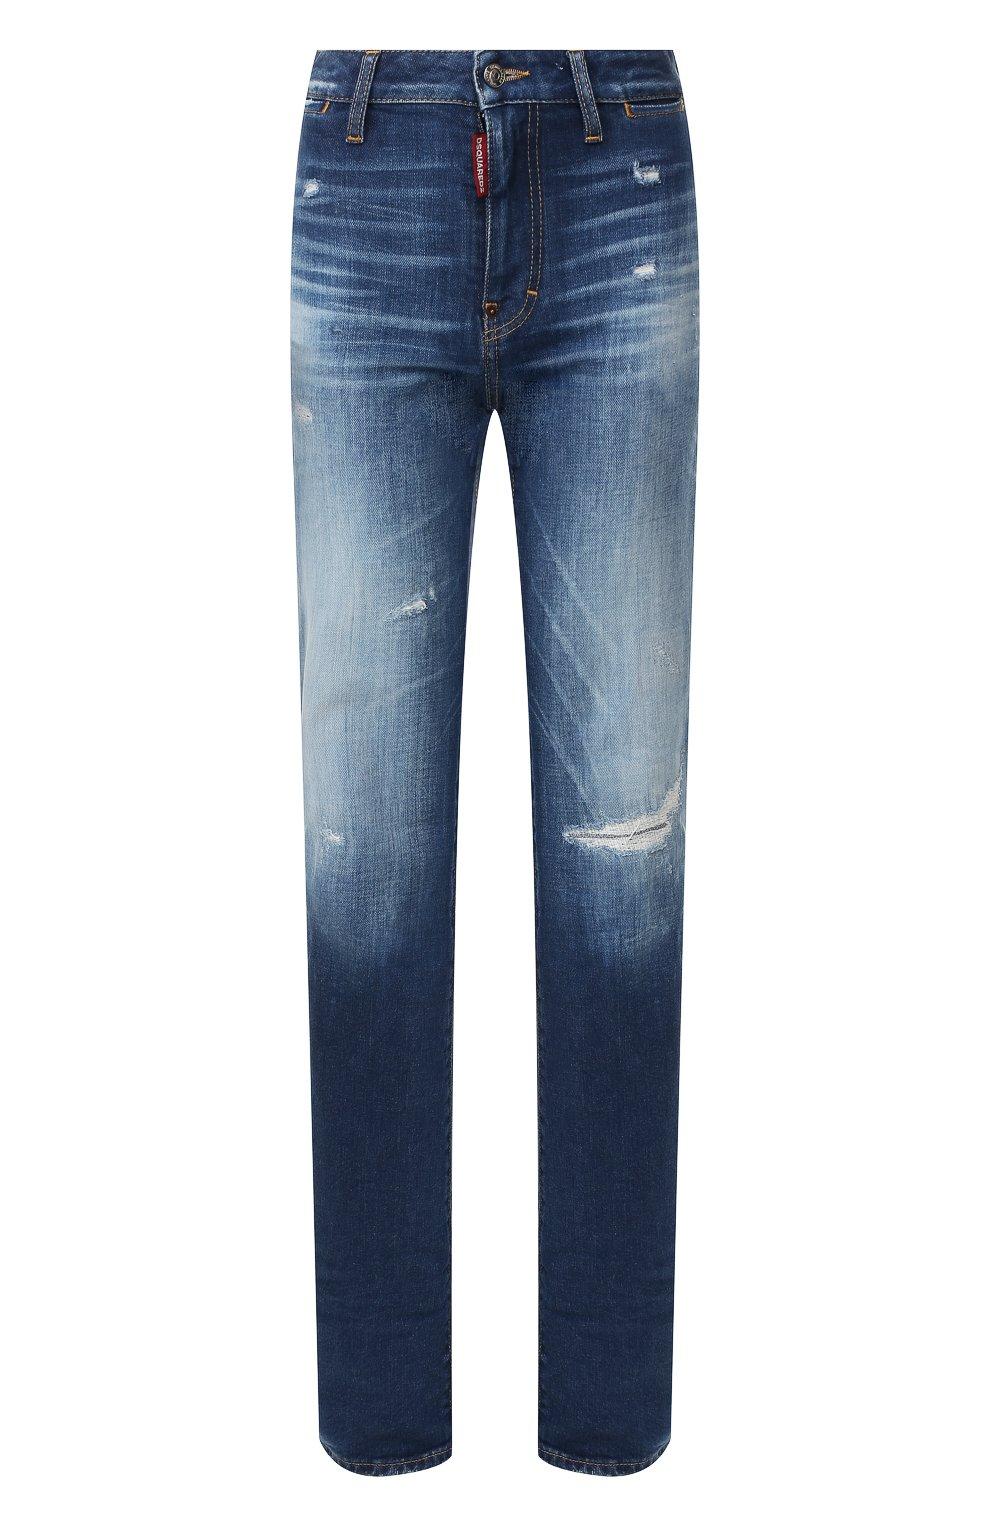 Женские джинсы DSQUARED2 синего цвета, арт. S75LB0314/S30663 | Фото 1